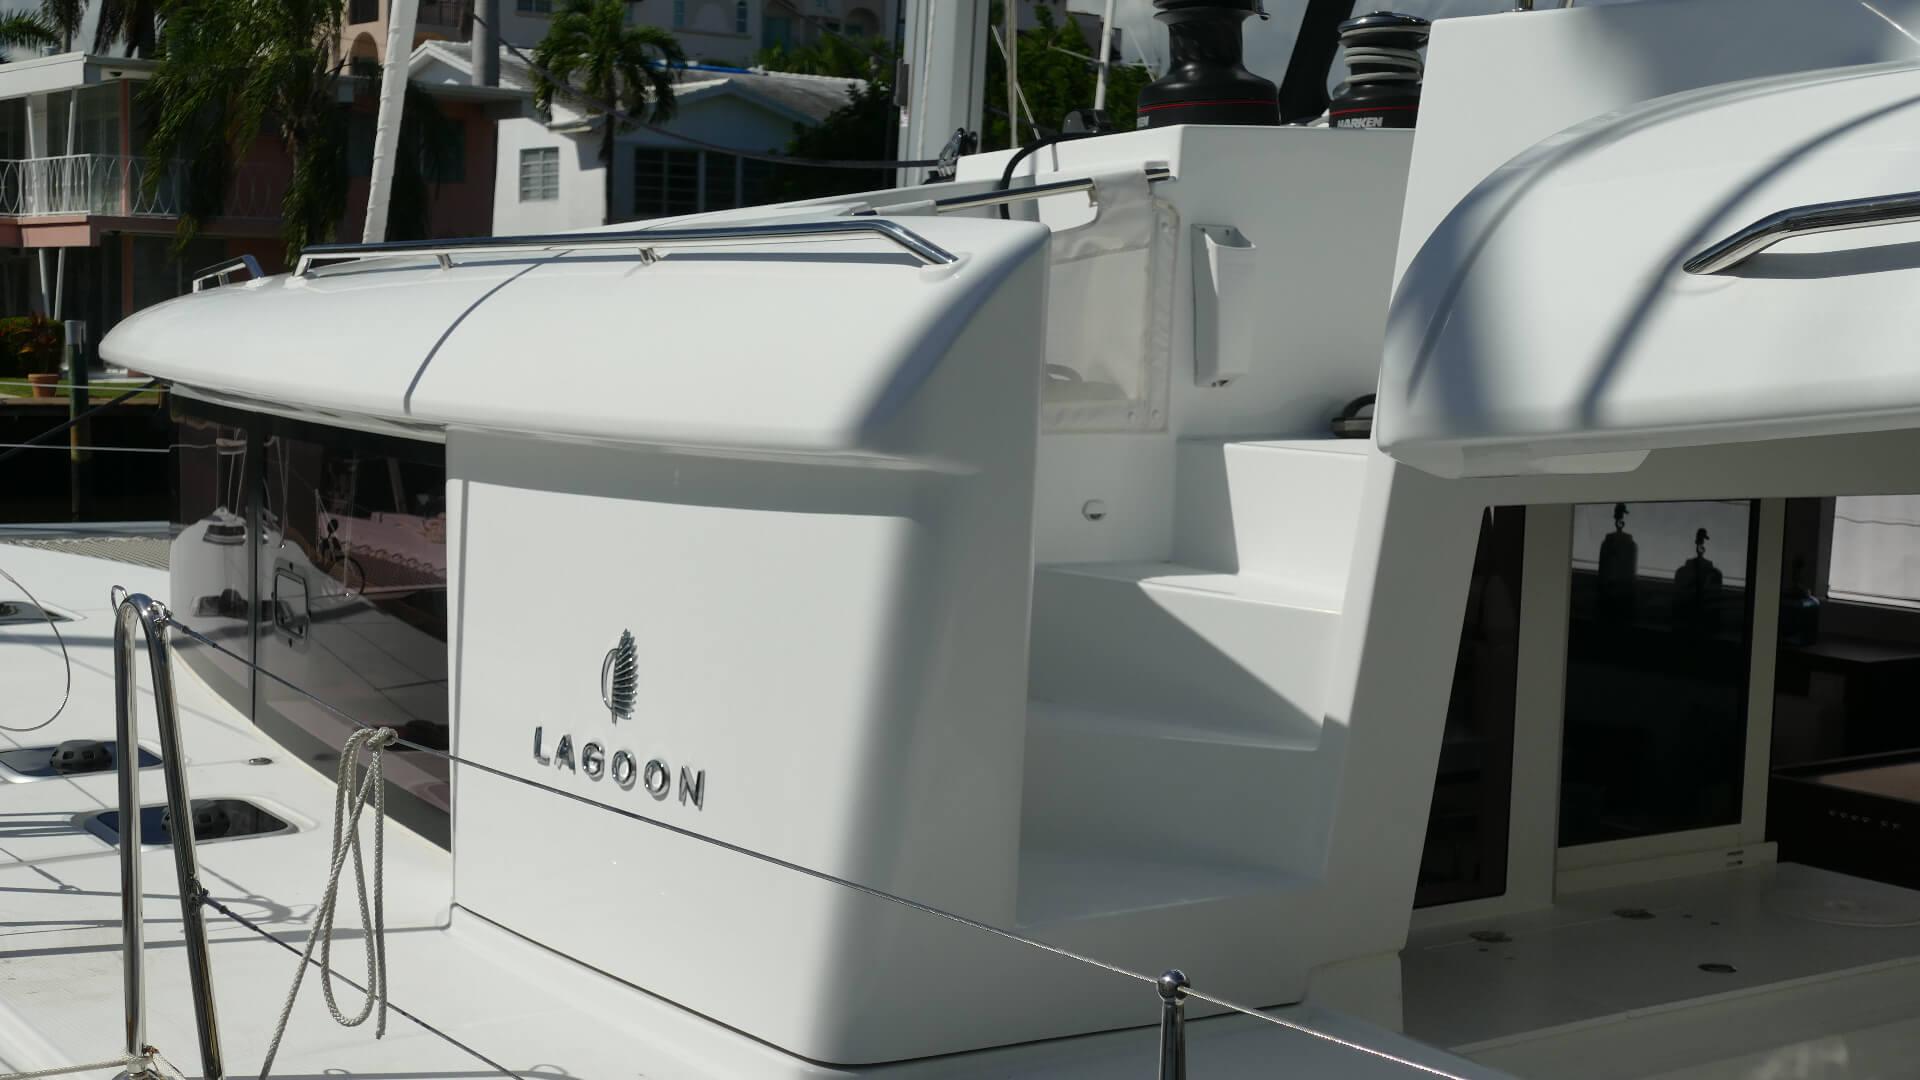 2019 LAGOON HULL 736